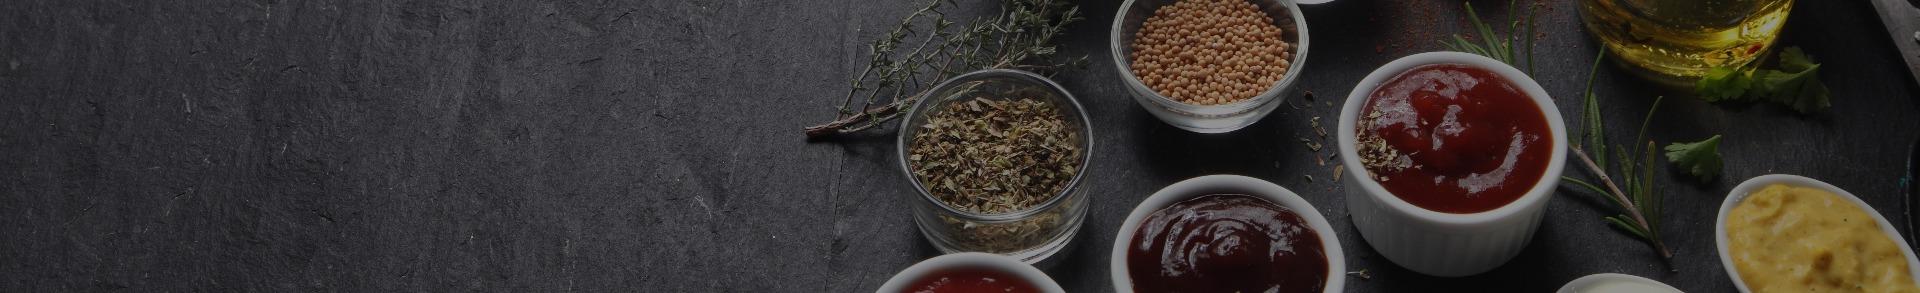 Cooking Ingredients & Condiments